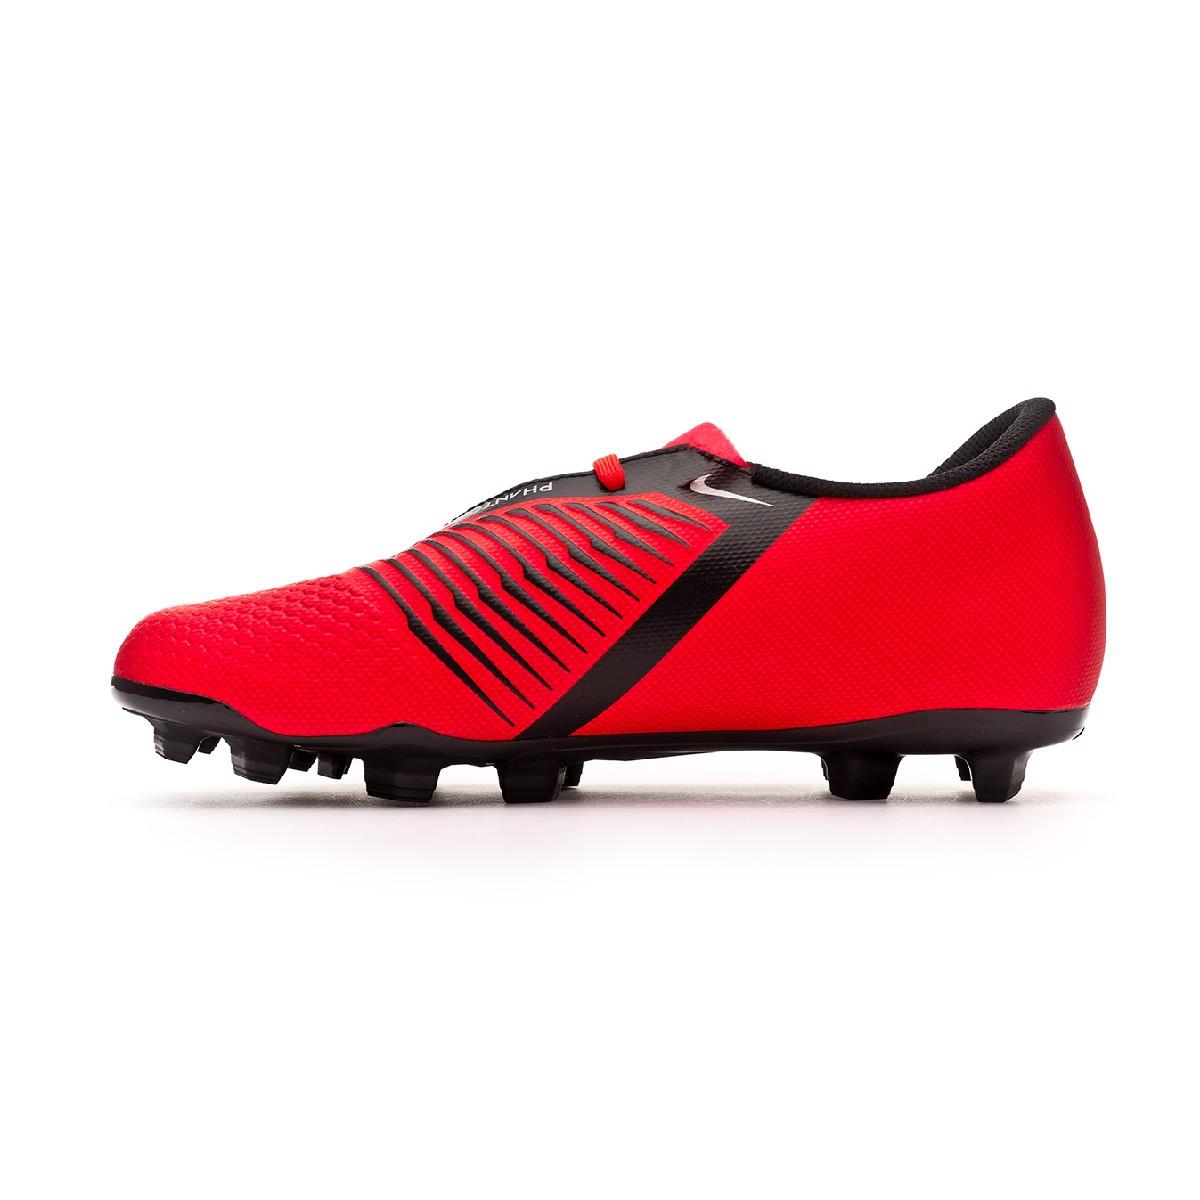 bosque Duquesa estrés  Football Boots Nike Phantom Venom Club FG Bright crimson-Black - Football  store Fútbol Emotion